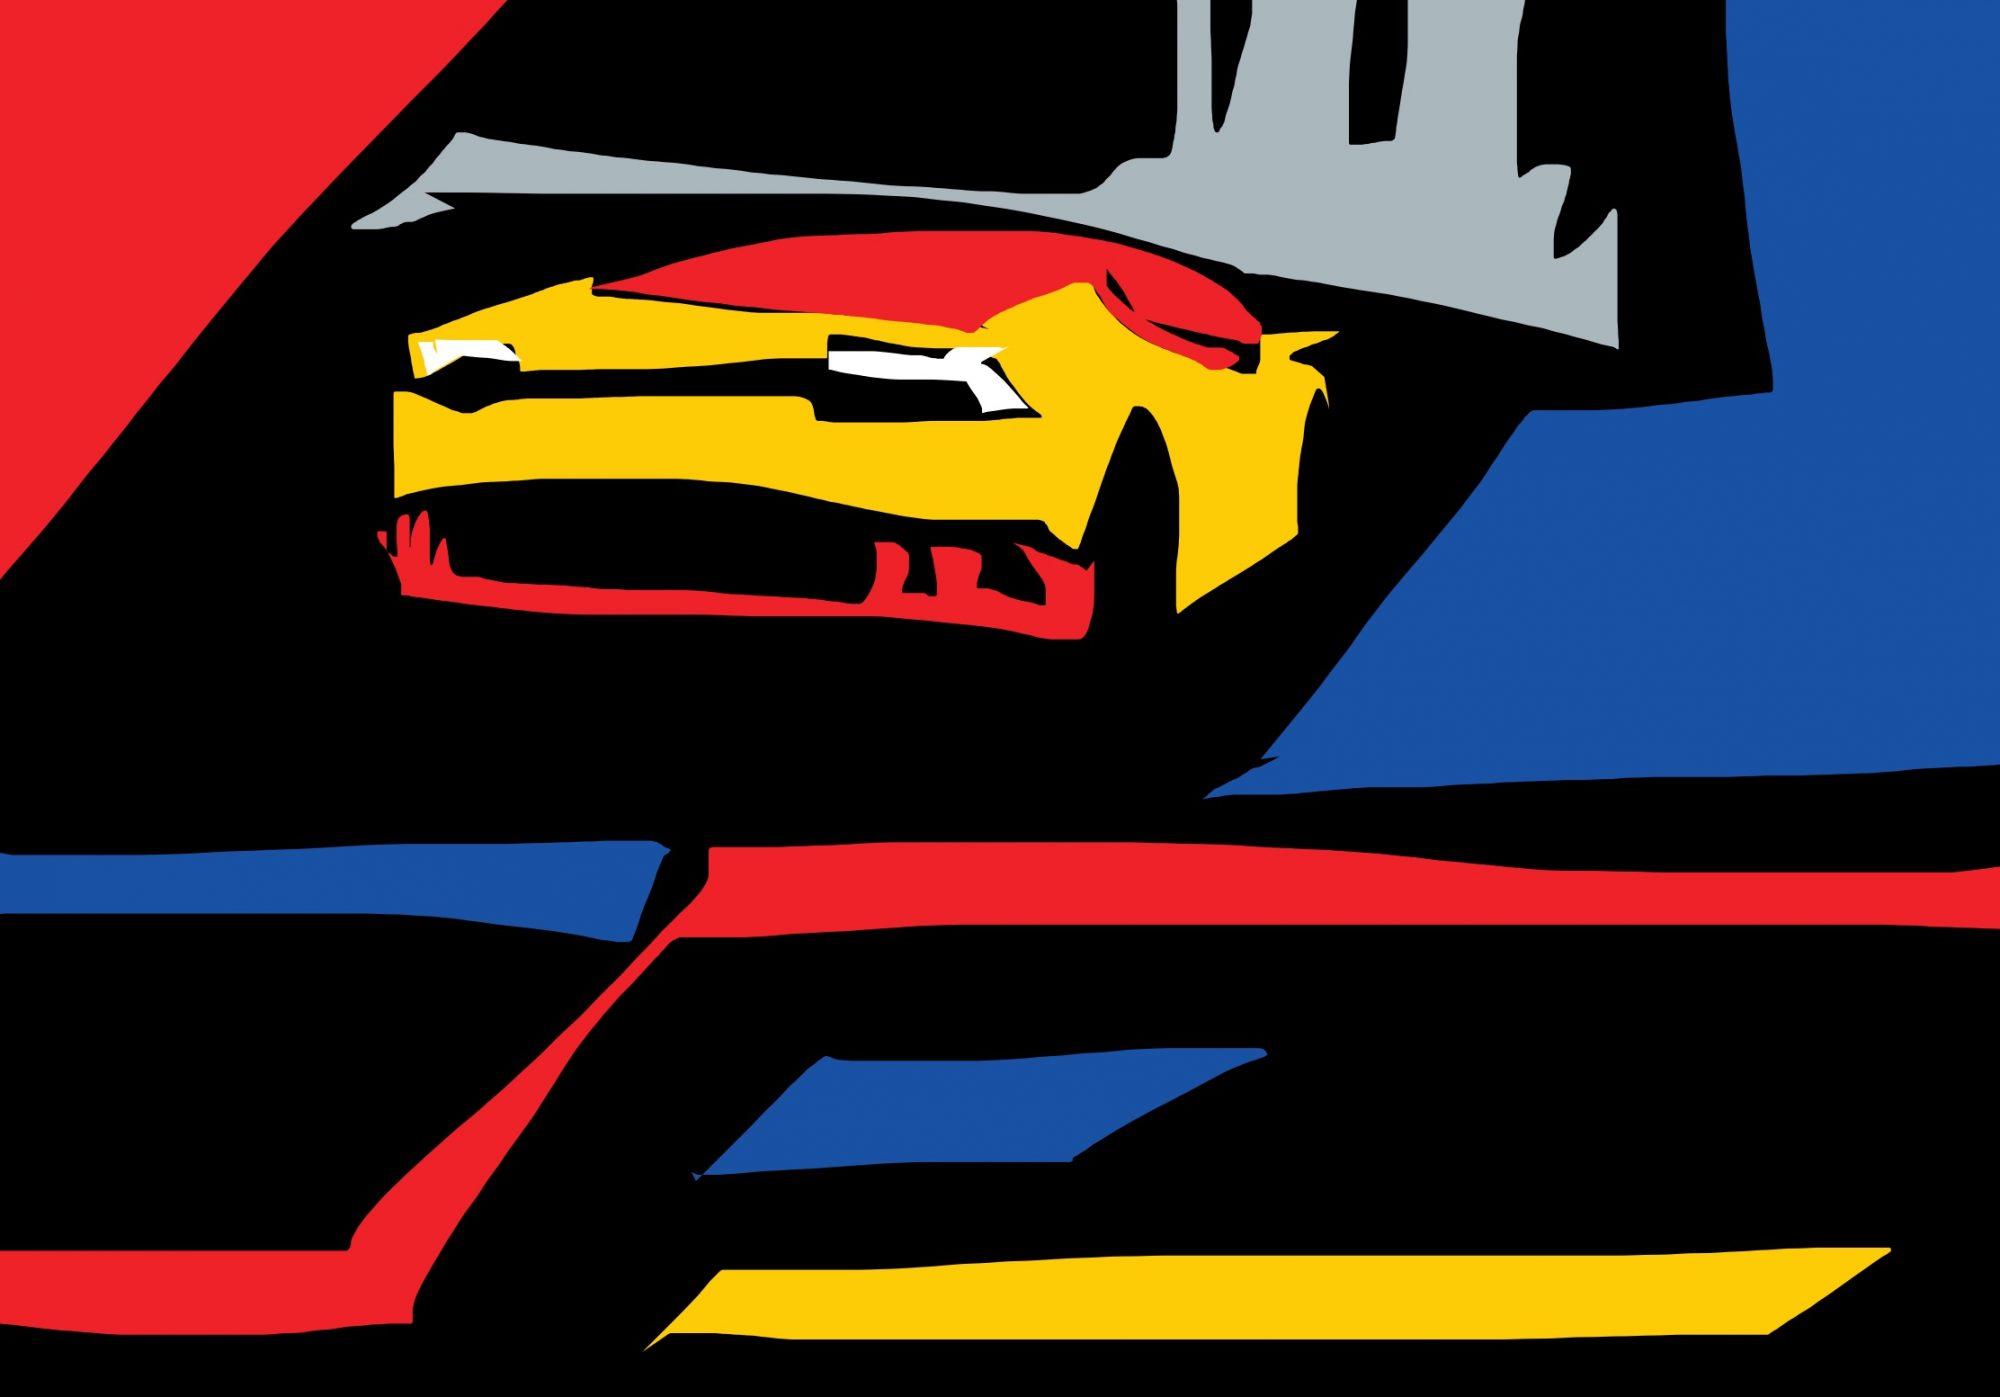 Lamborghini abstract by ERIC KIM